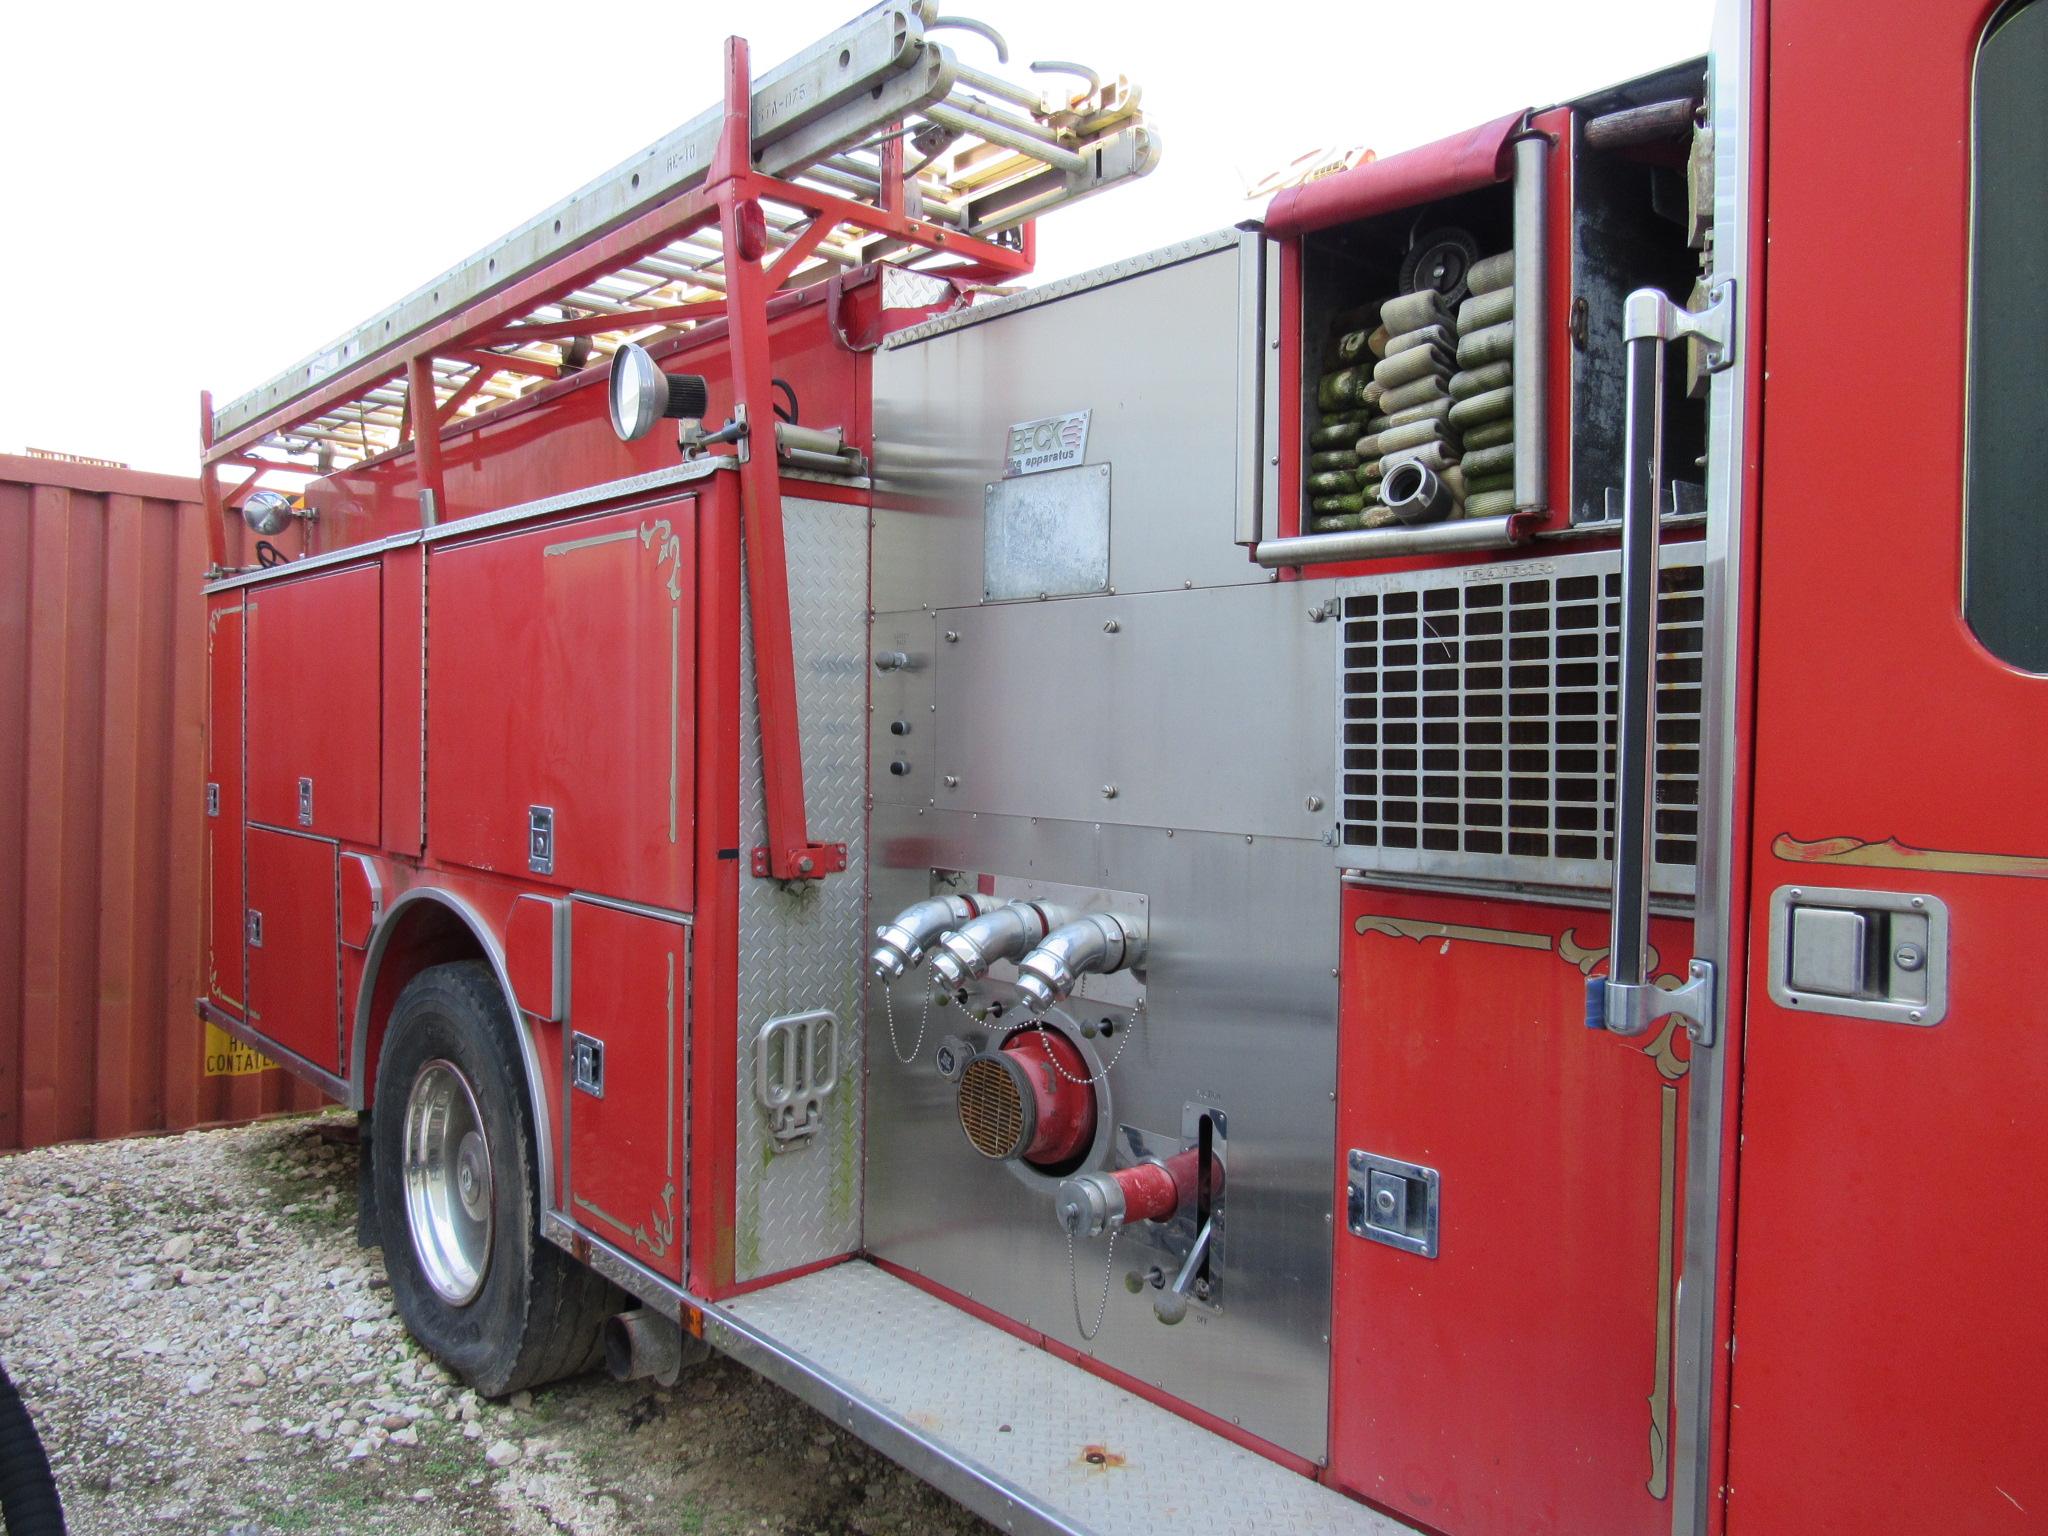 Ottawa / Beck Fire Truck - Image 5 of 6